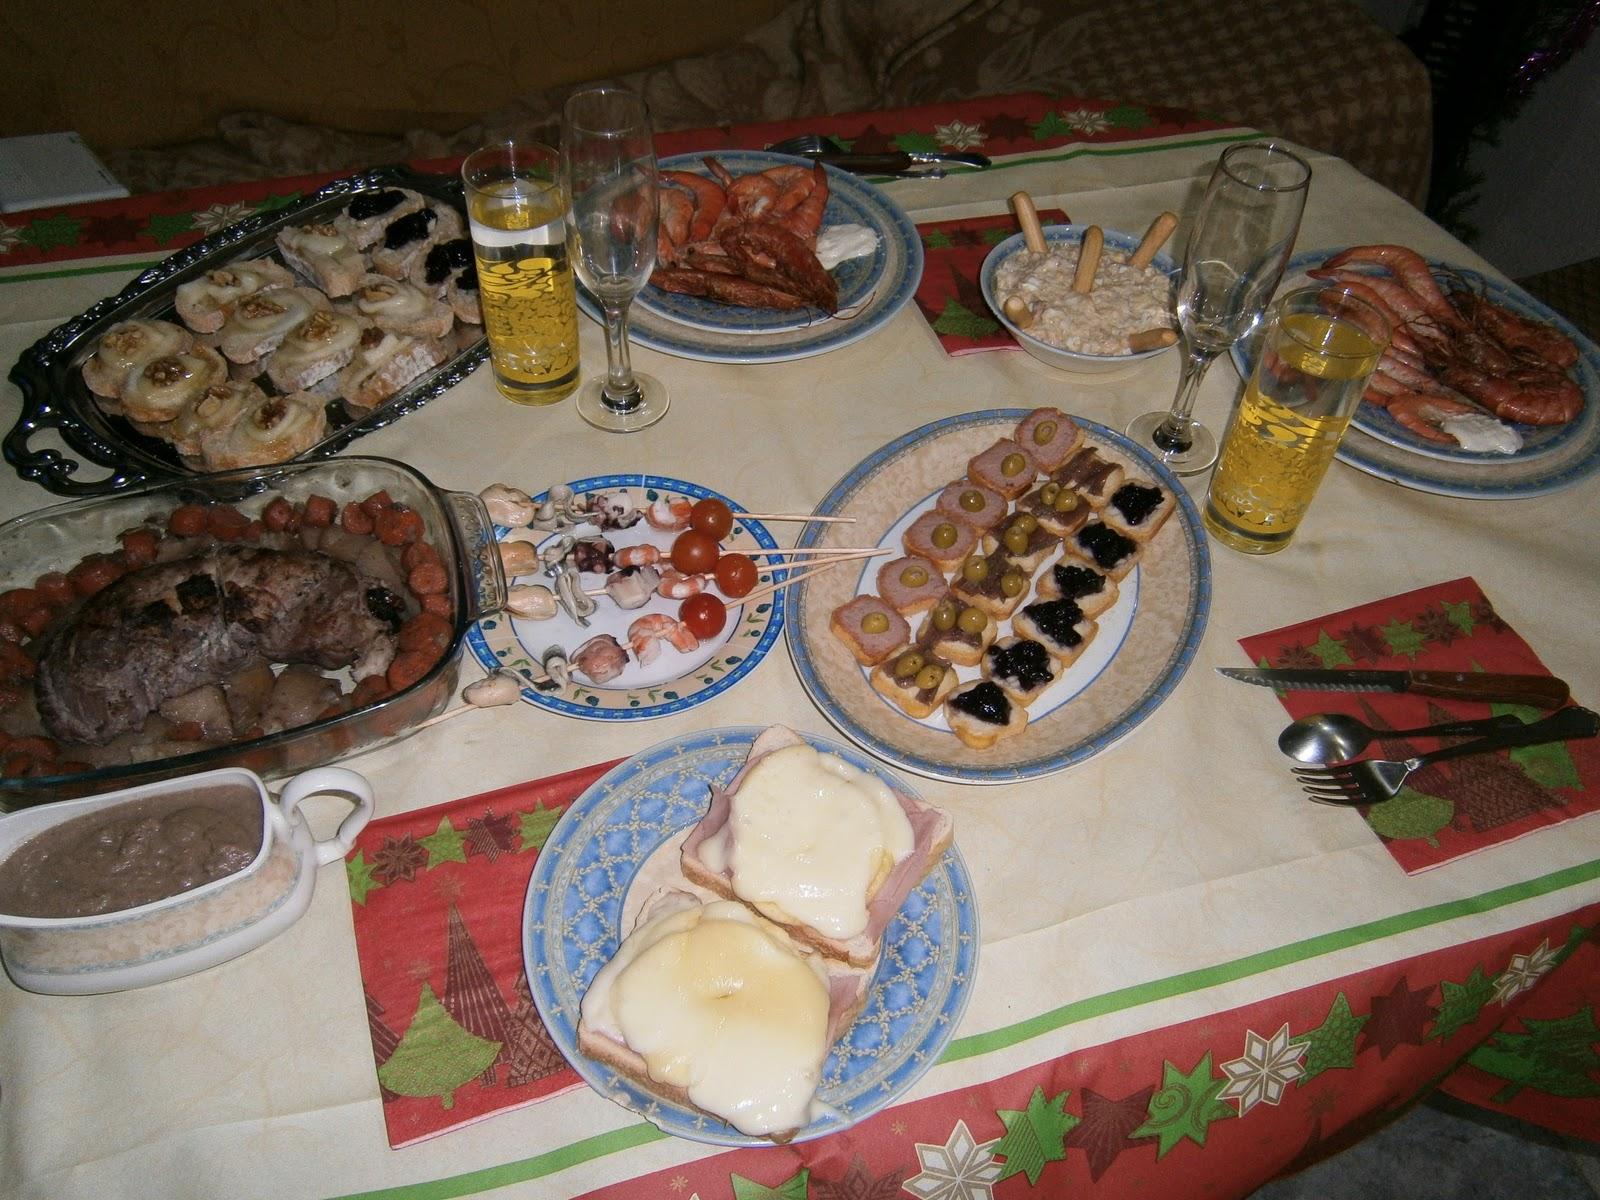 Nuestra cena de fin de a o 2011 cosas de animalillos - Cenas para fin de ano ...